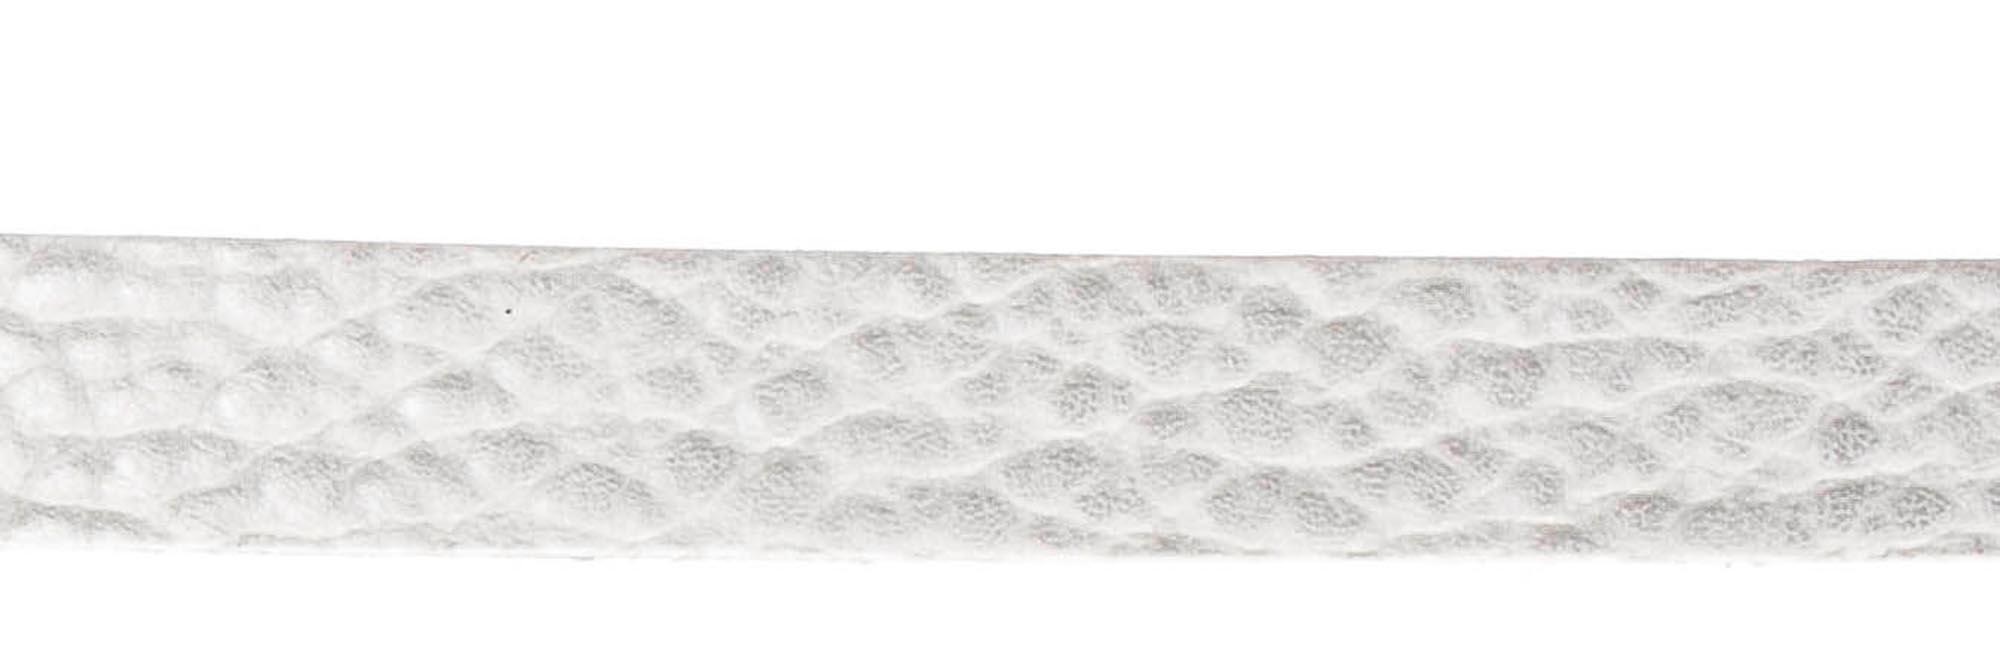 Vanzetti 15 mm Gürtel